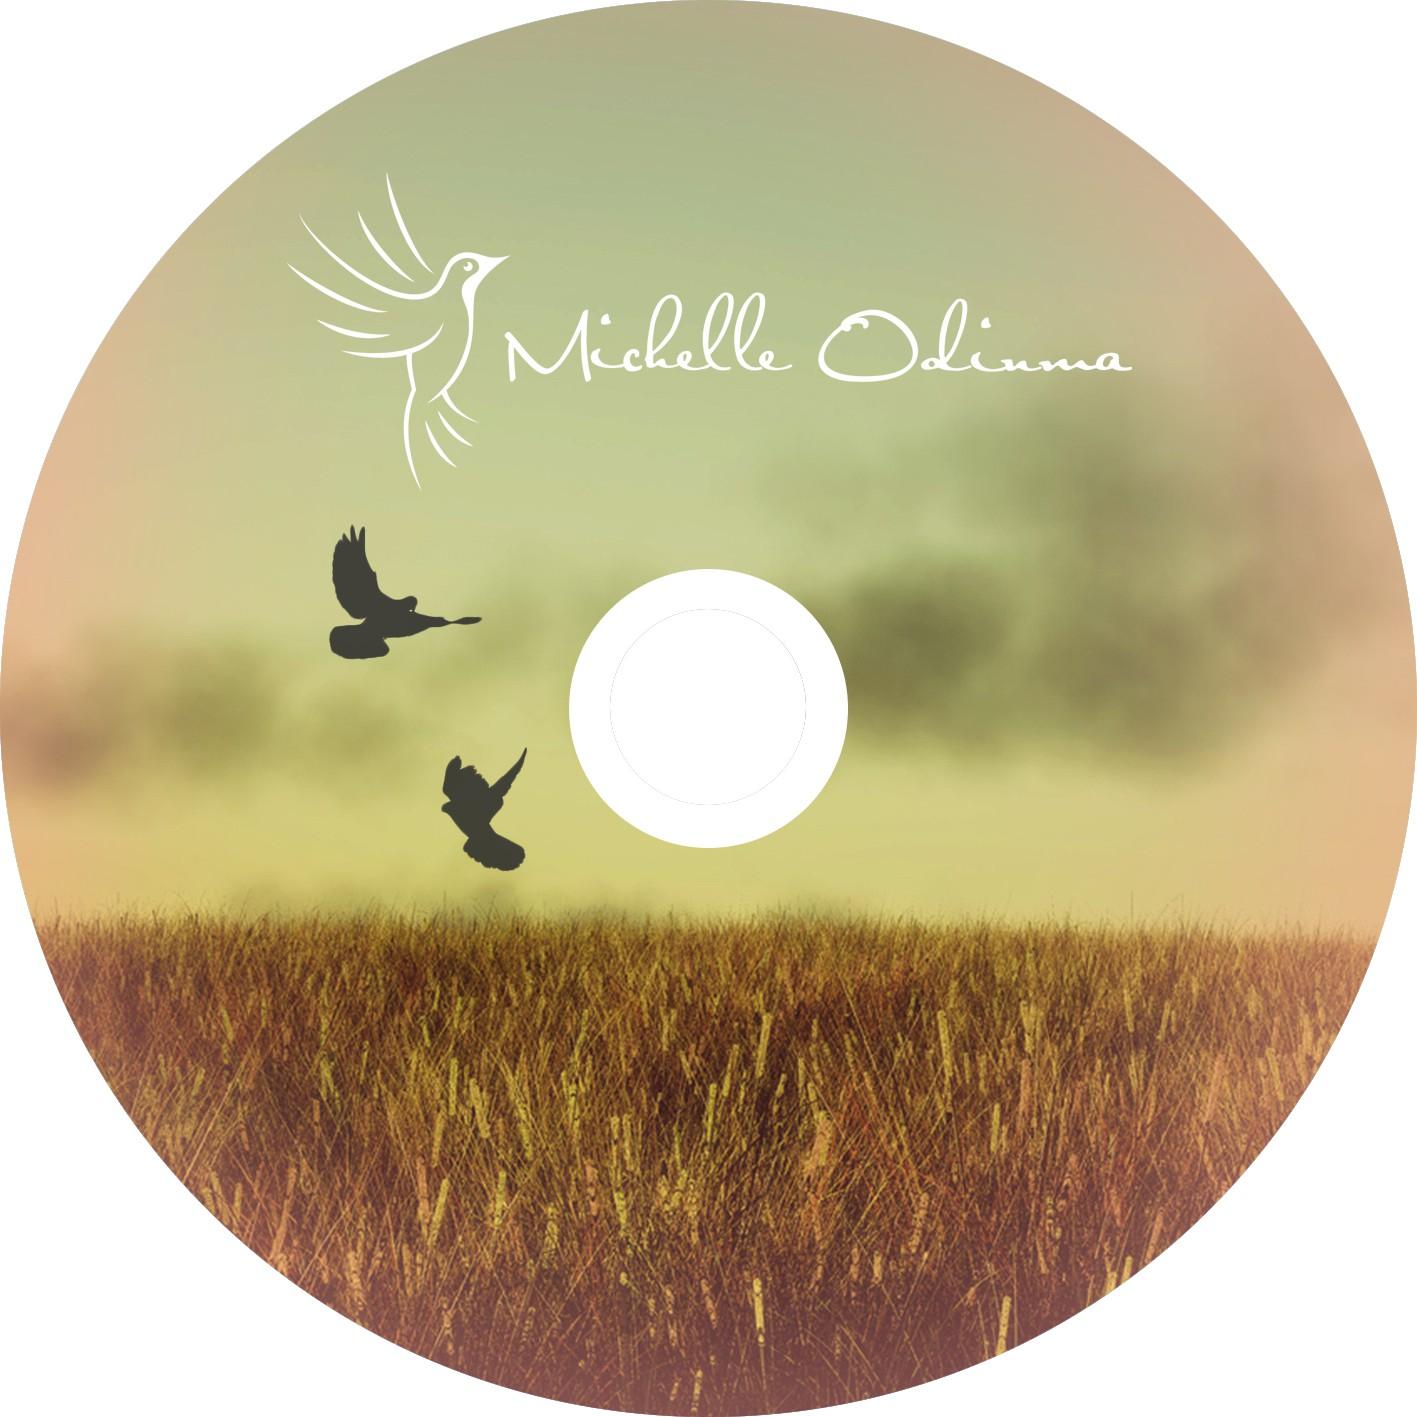 Hymn Album Cover